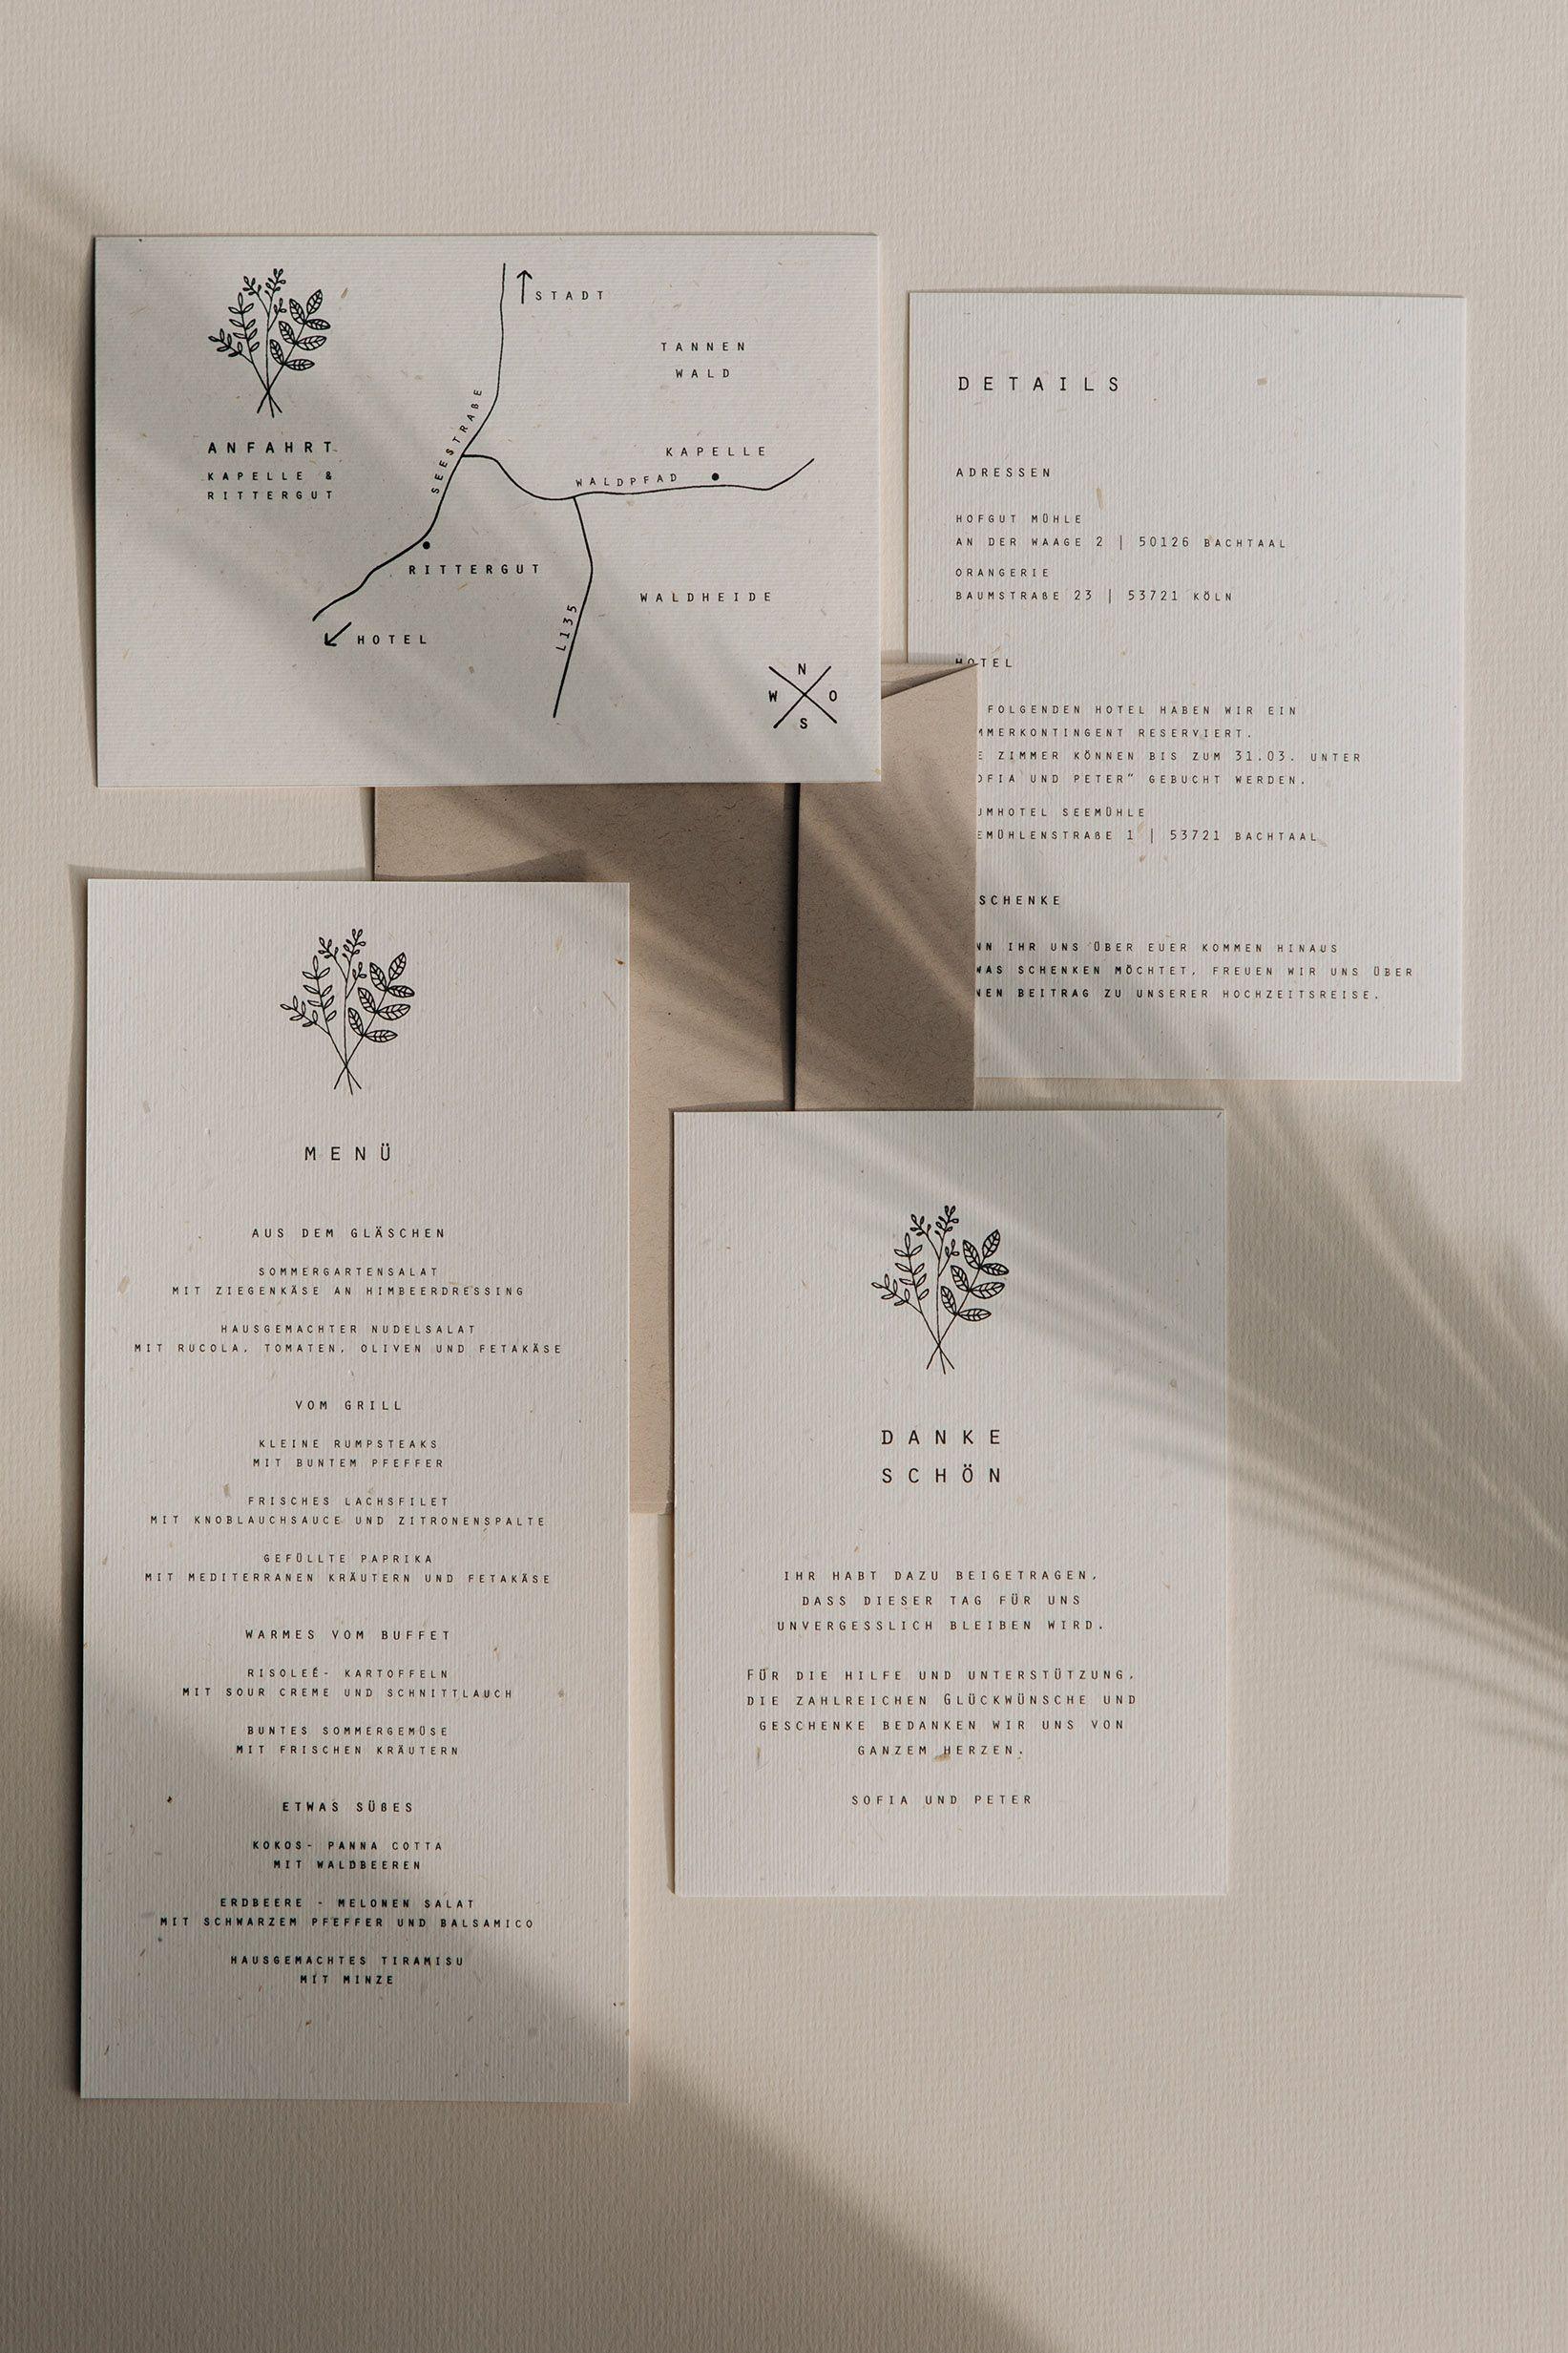 Modern Minimalist Wedding Stationery Hochzeitskarten Hochzeitseinladung Hochzeitskarten Ideen